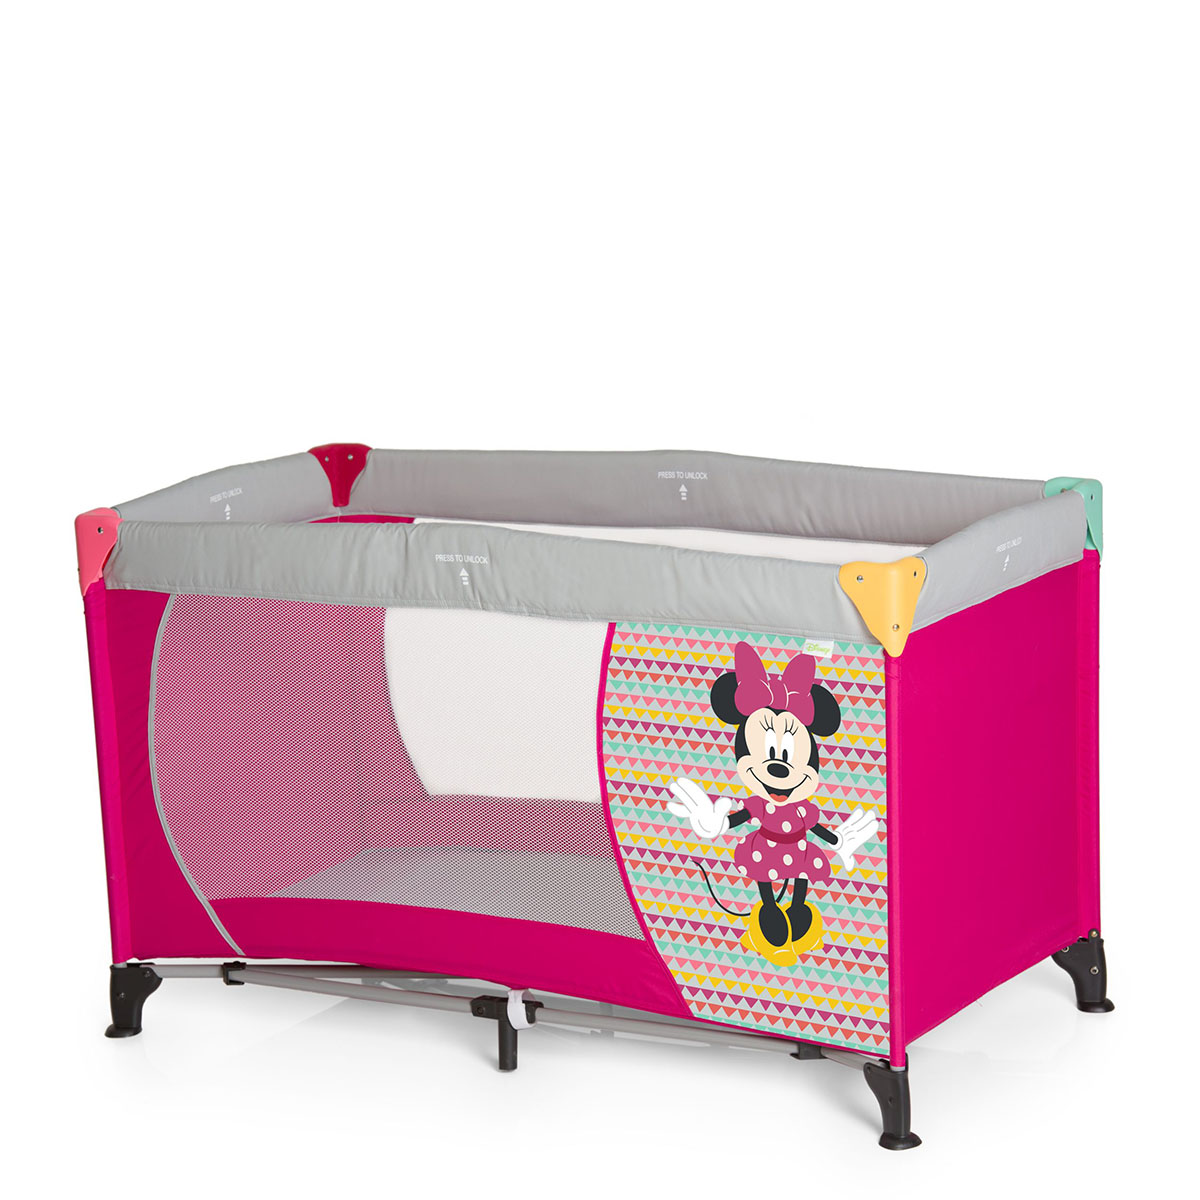 Hauck sklopivi krevetac Hauck DREAM'N PLAY Minnie pink